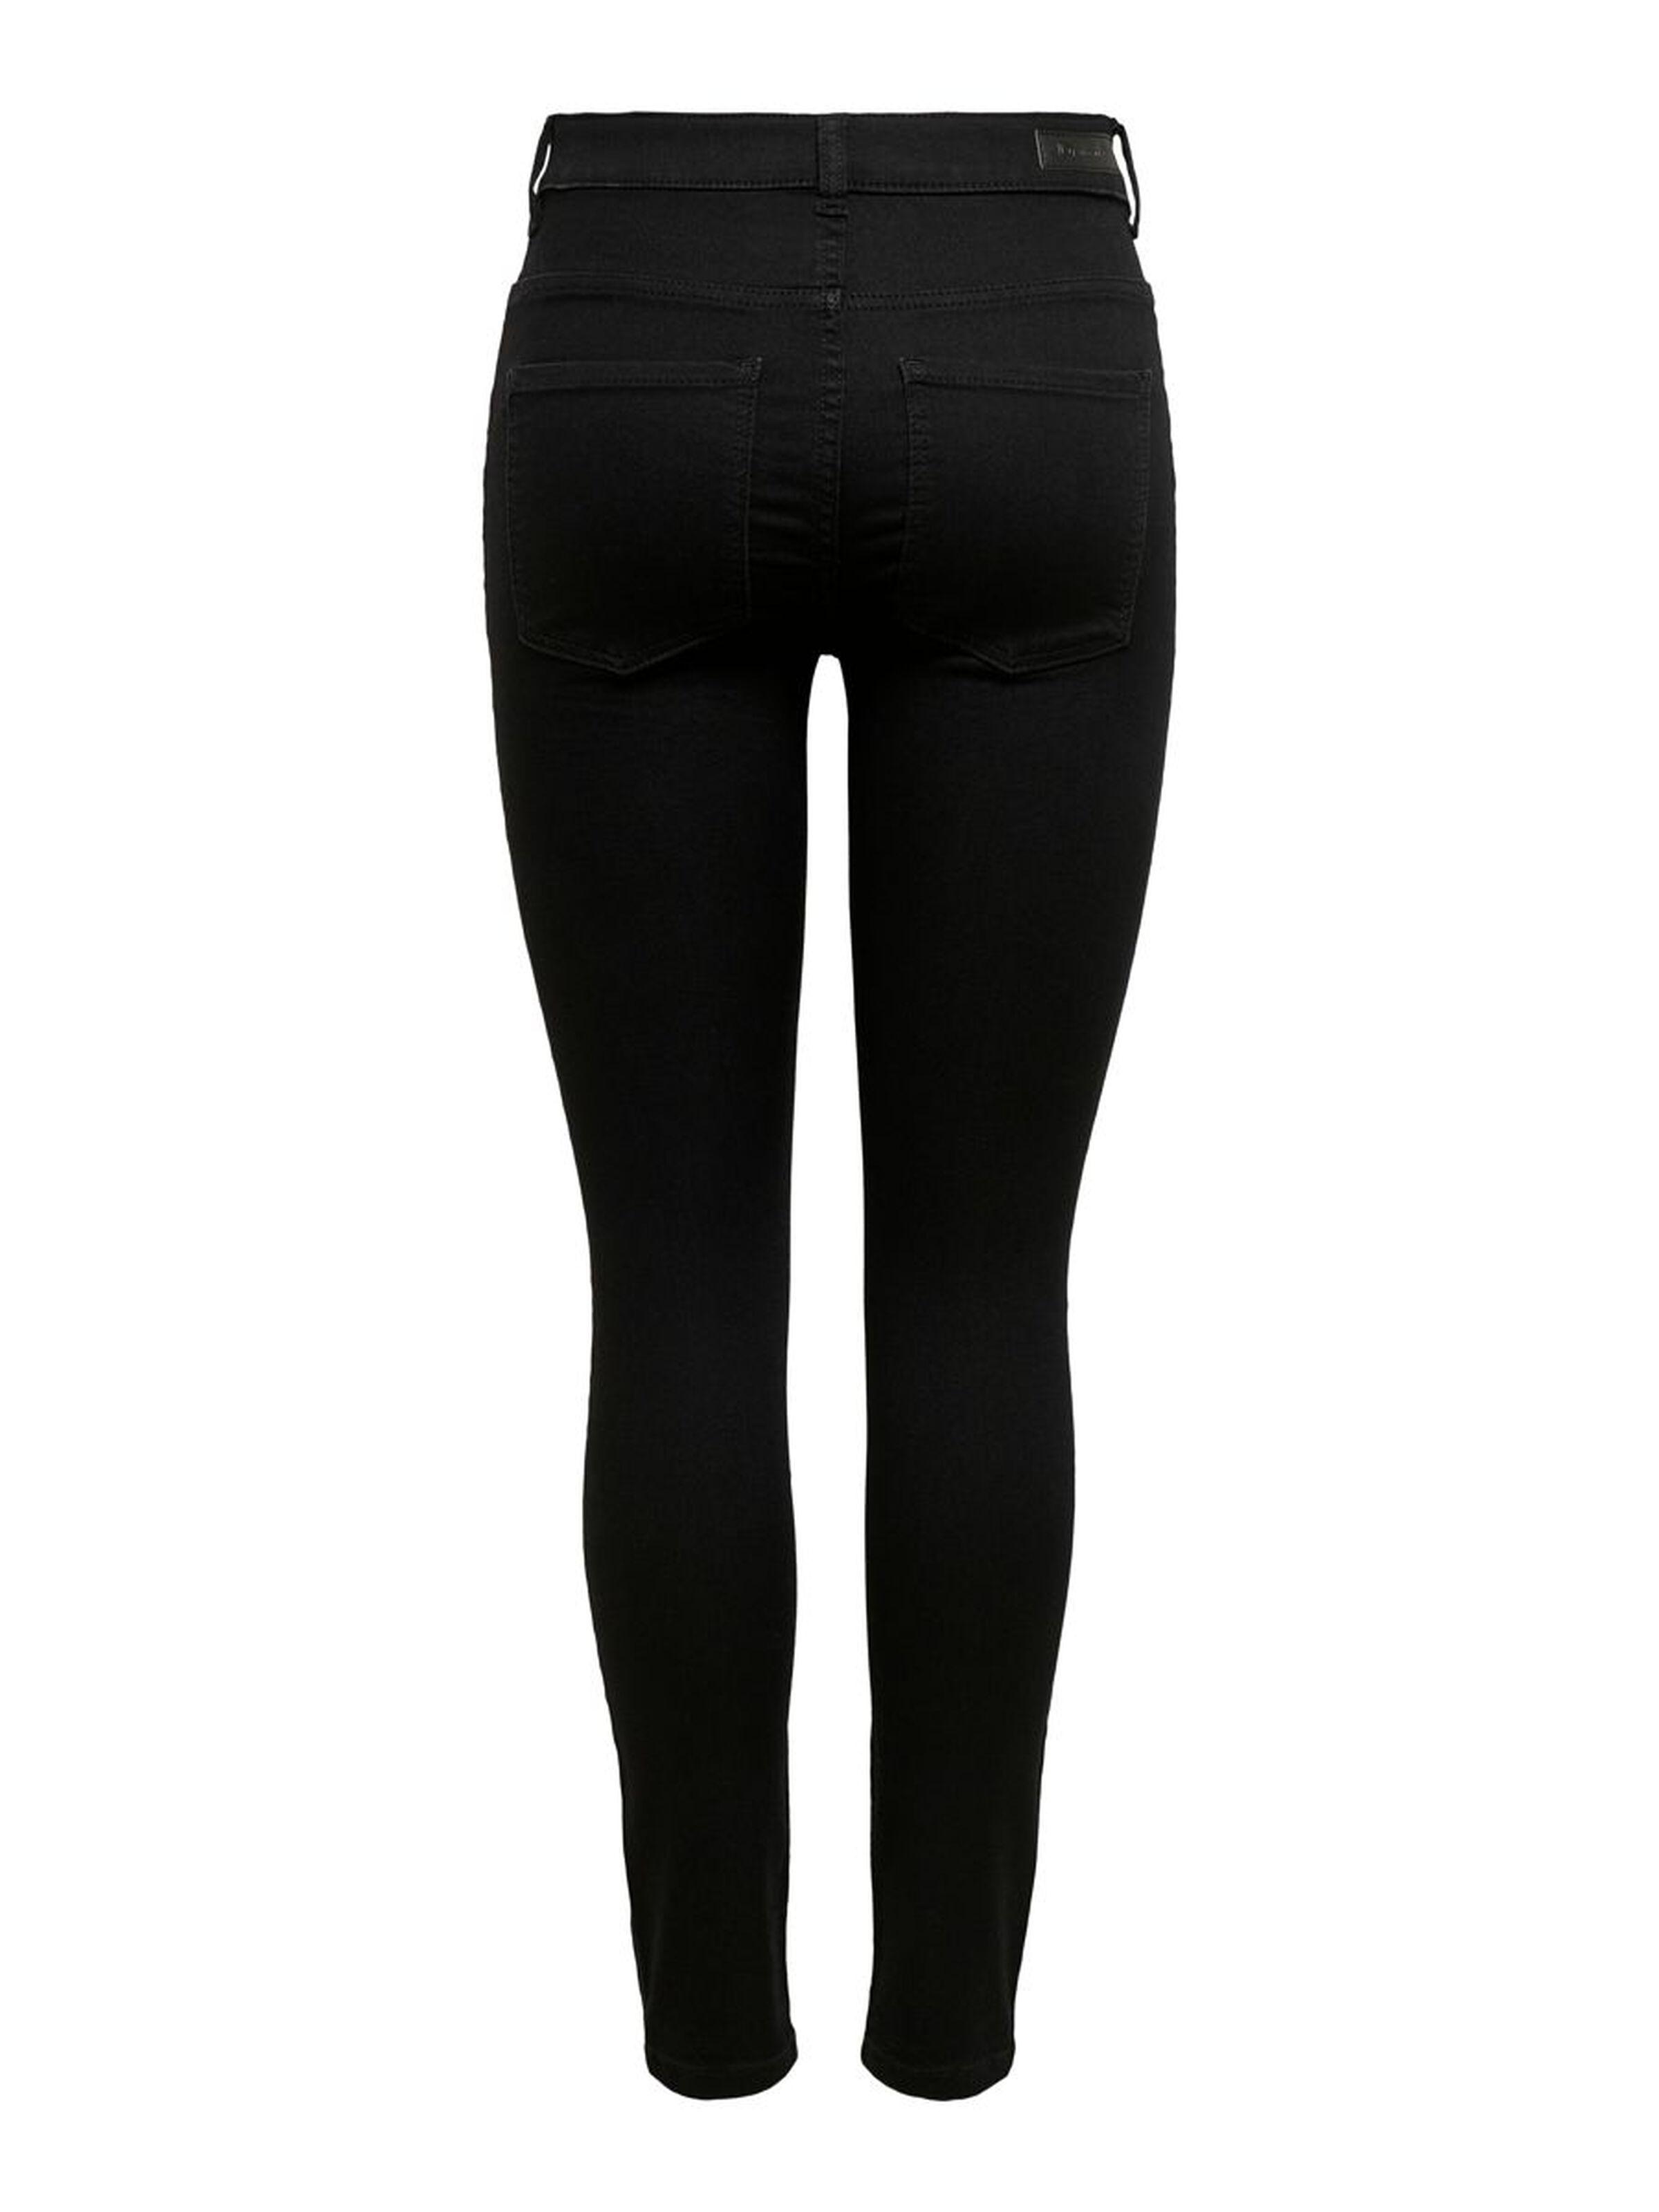 Jeans donna skinny fit JDY | NEWNIKKI-15208239BLKL30